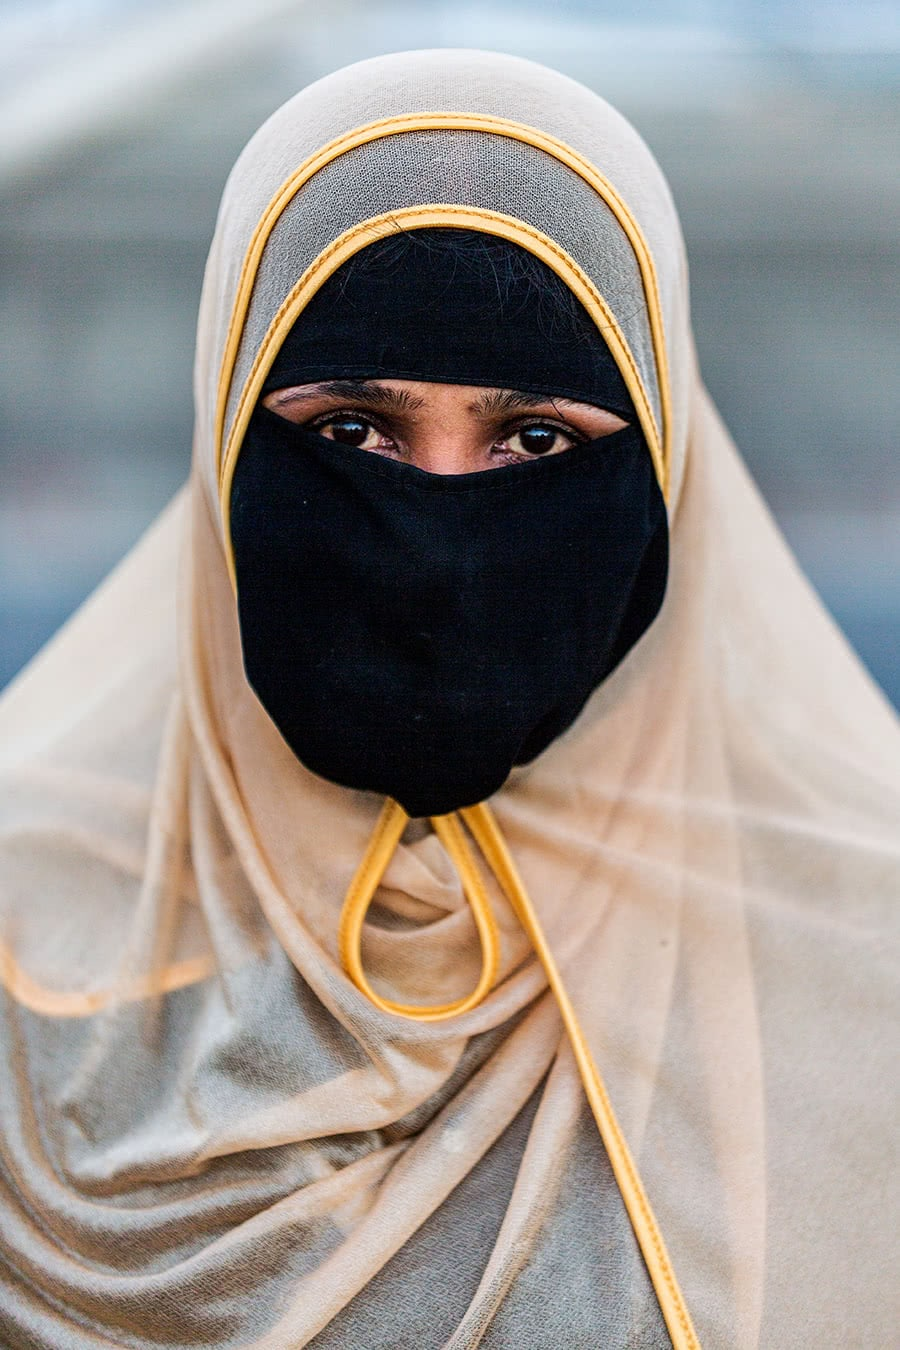 A woman wearing a Burka in Chittagong, Bangladesh.